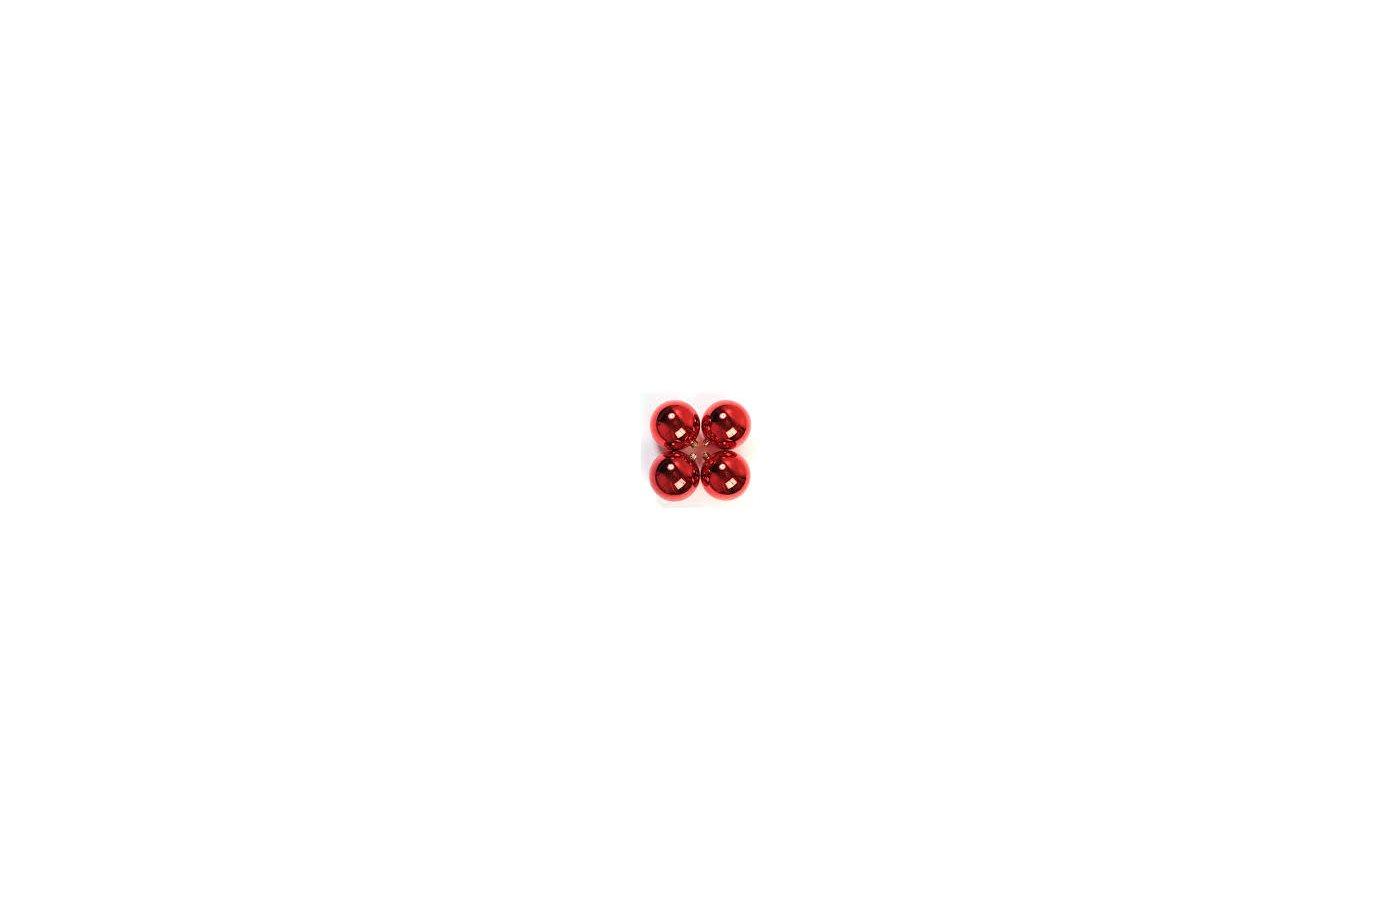 Игрушка Сноу Бум Набор шаров 60мм 6шт 373-031